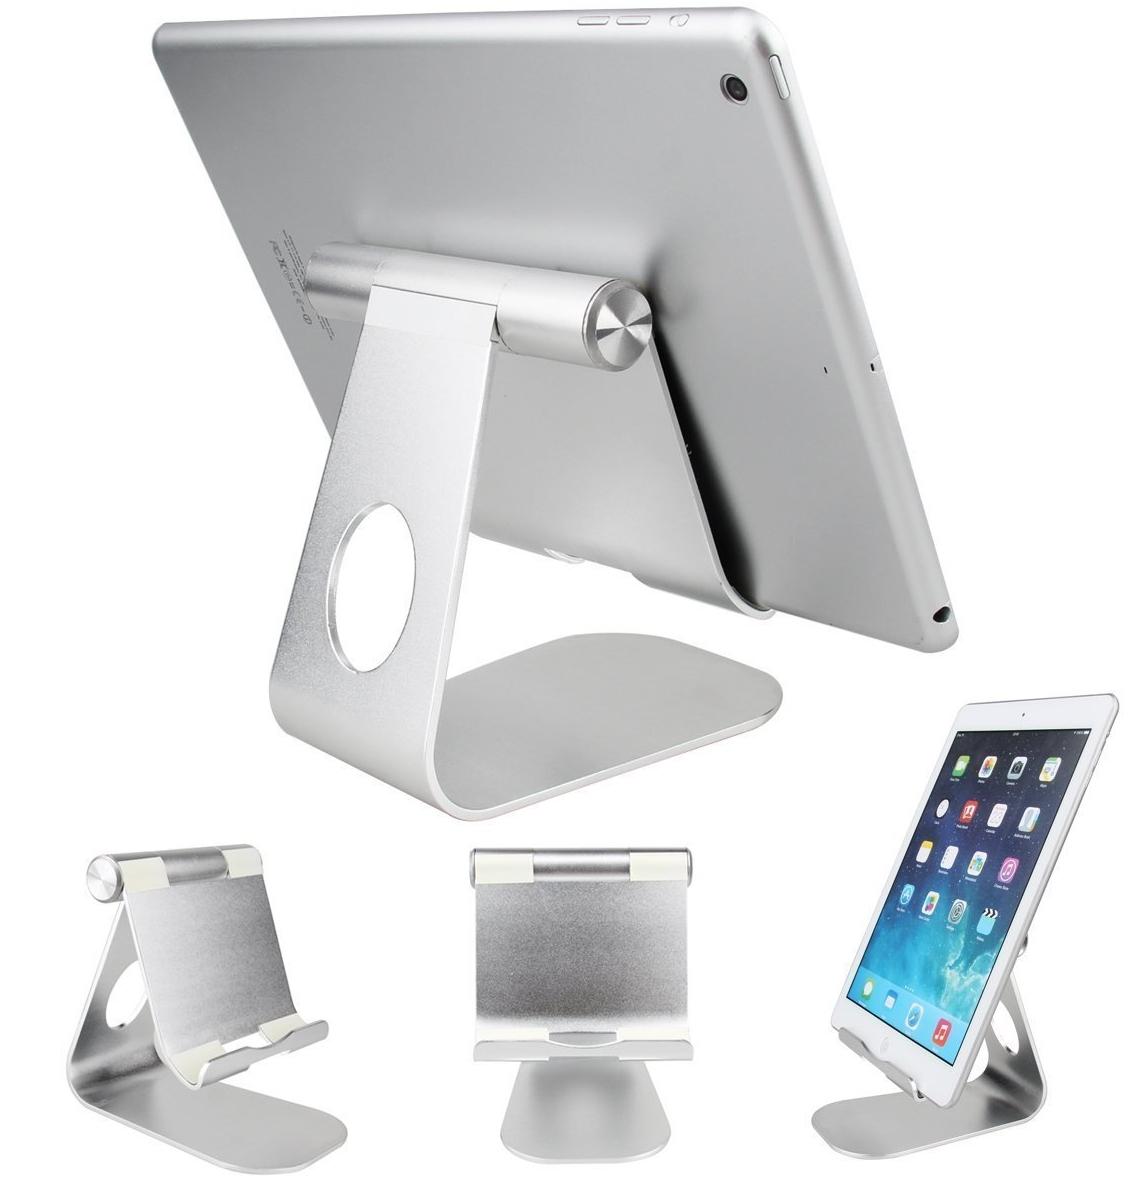 verstellbarer tablet st nder aus silbernem aluminium f r ipad tablet pc e book reader co. Black Bedroom Furniture Sets. Home Design Ideas